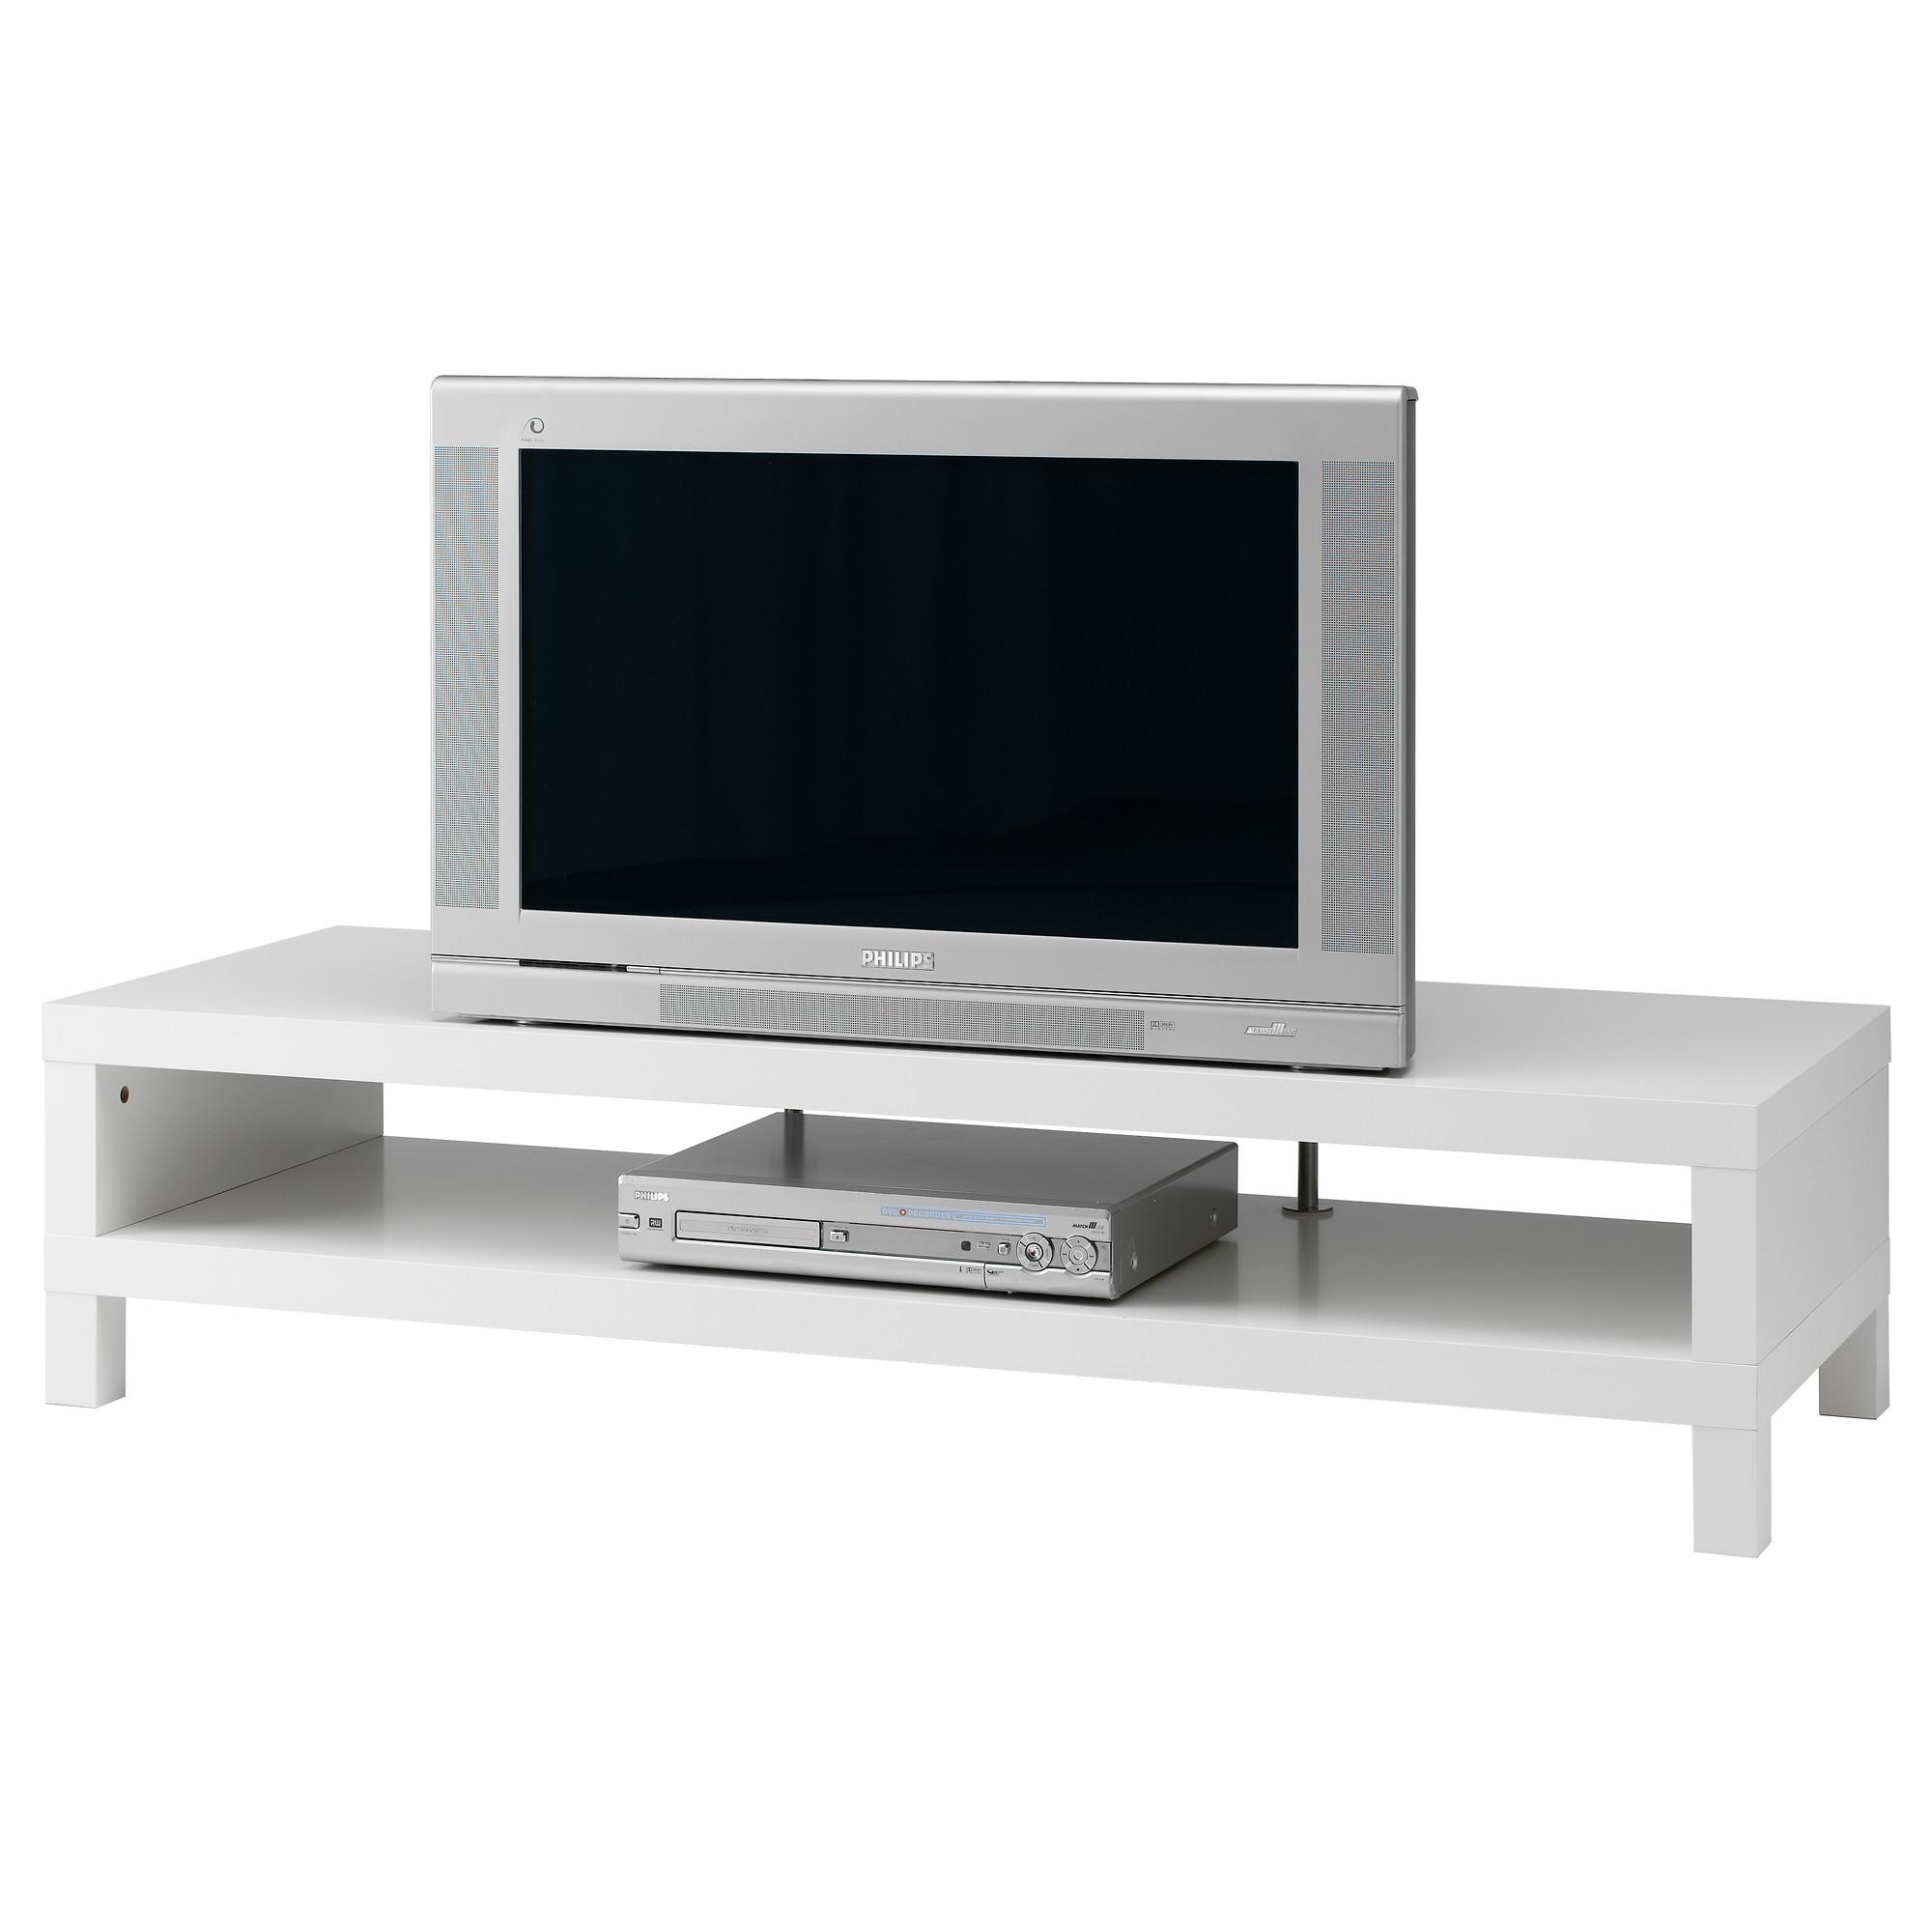 LACK mueble TV, blanco